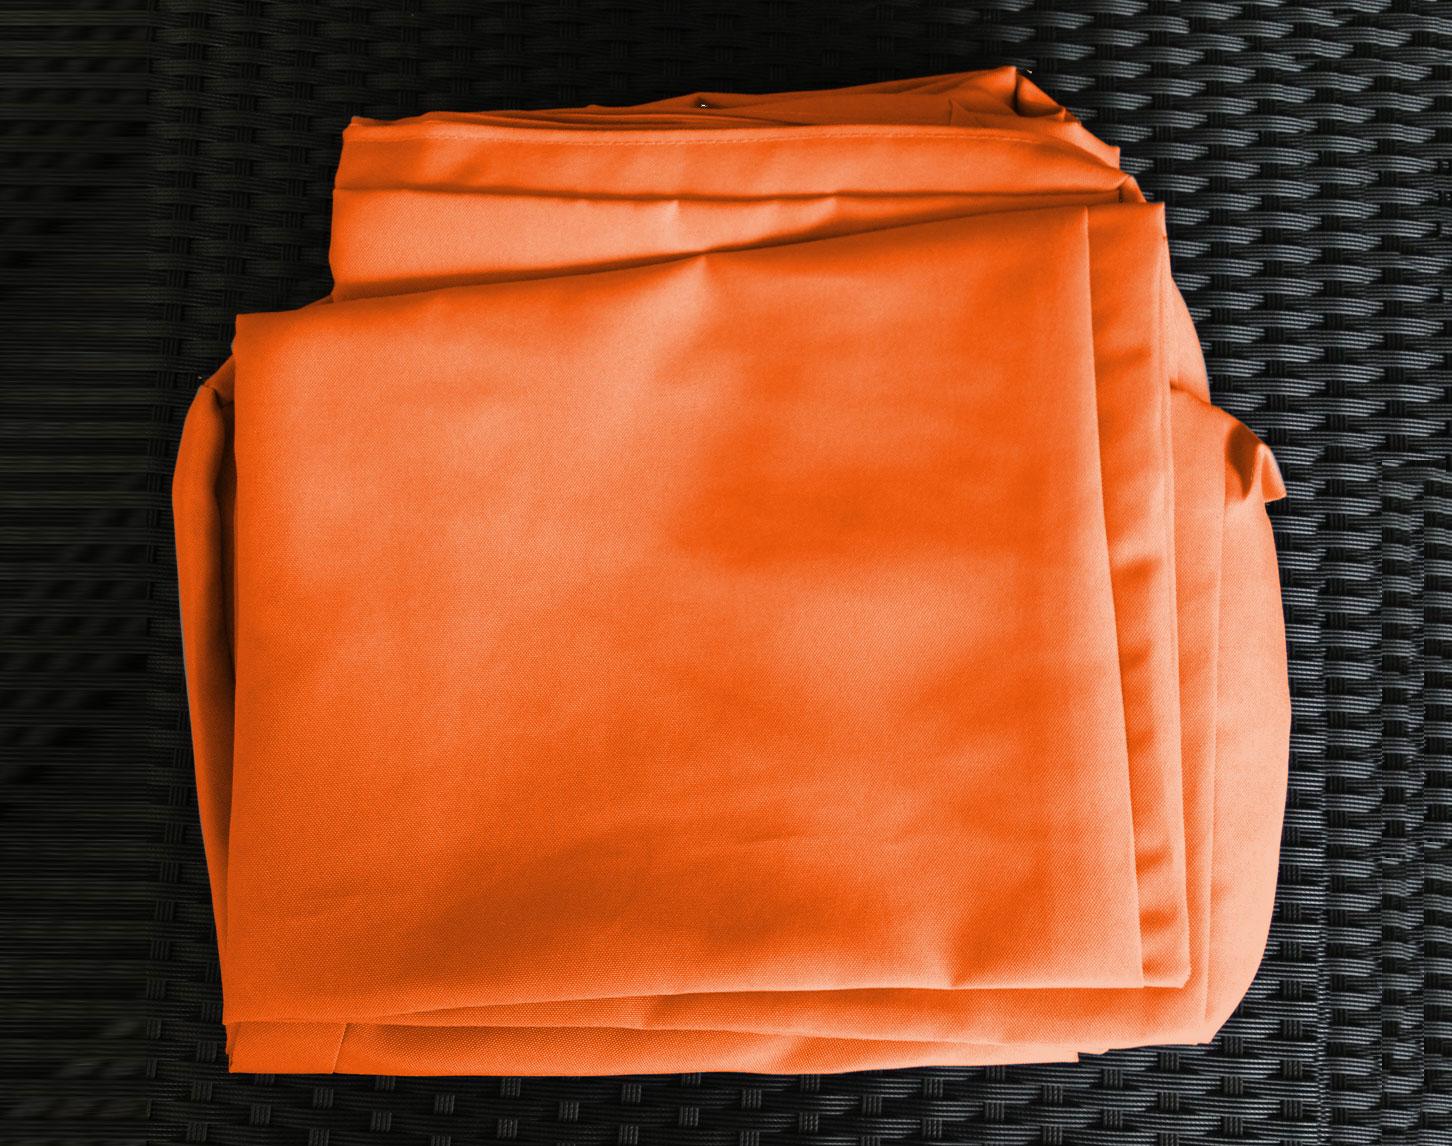 Tissu Jeu Housses Pour De Salon Bali Orange Jardin dBCxoe